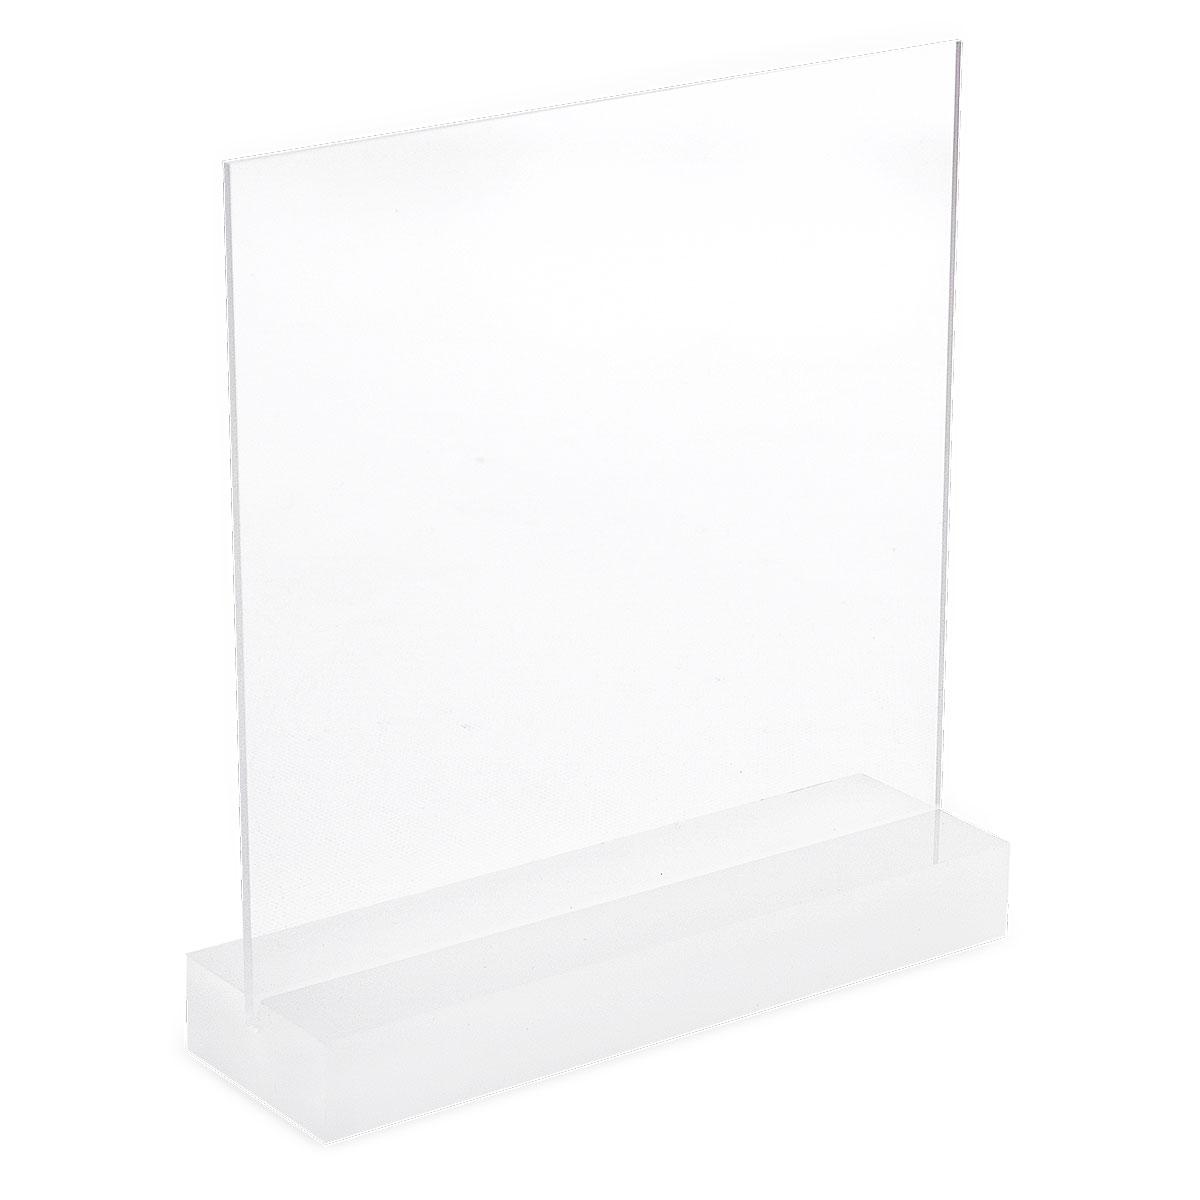 Planchas metacrilato transparente